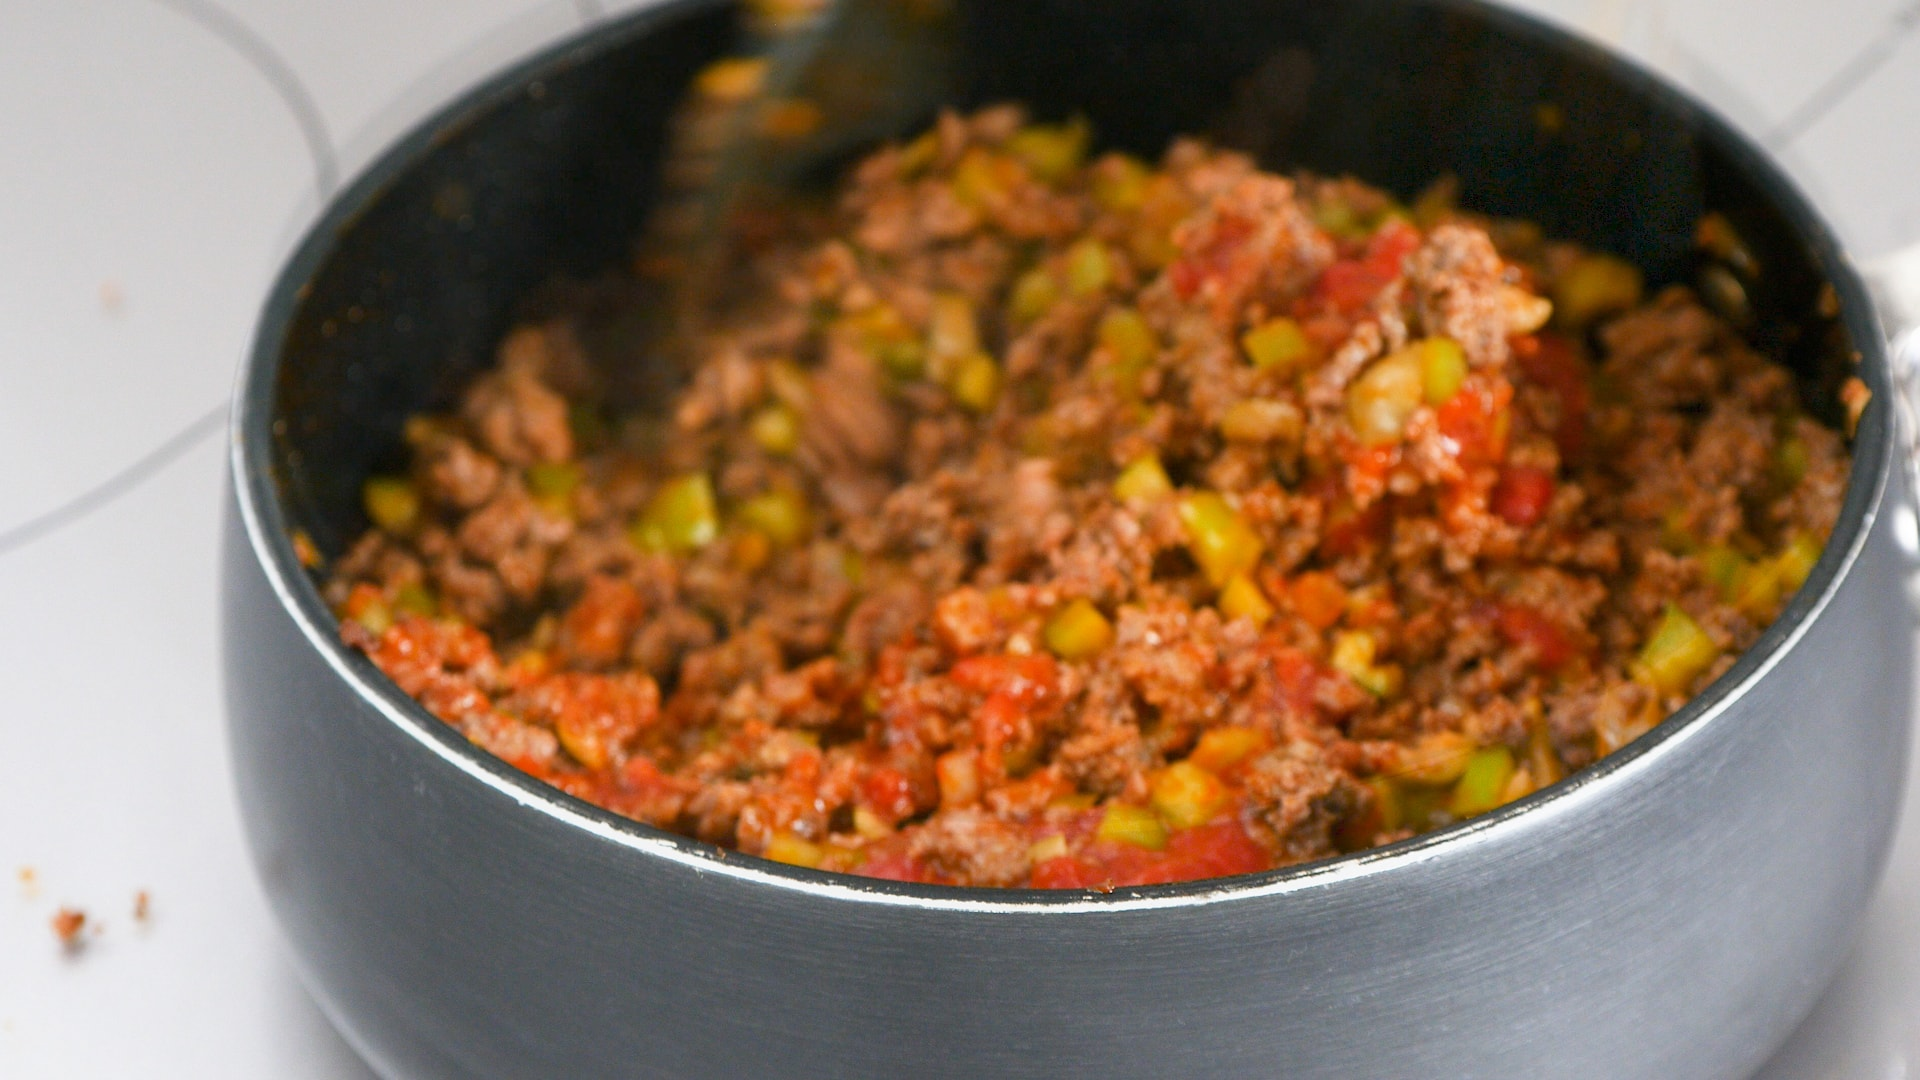 Chorizo filling ready to use